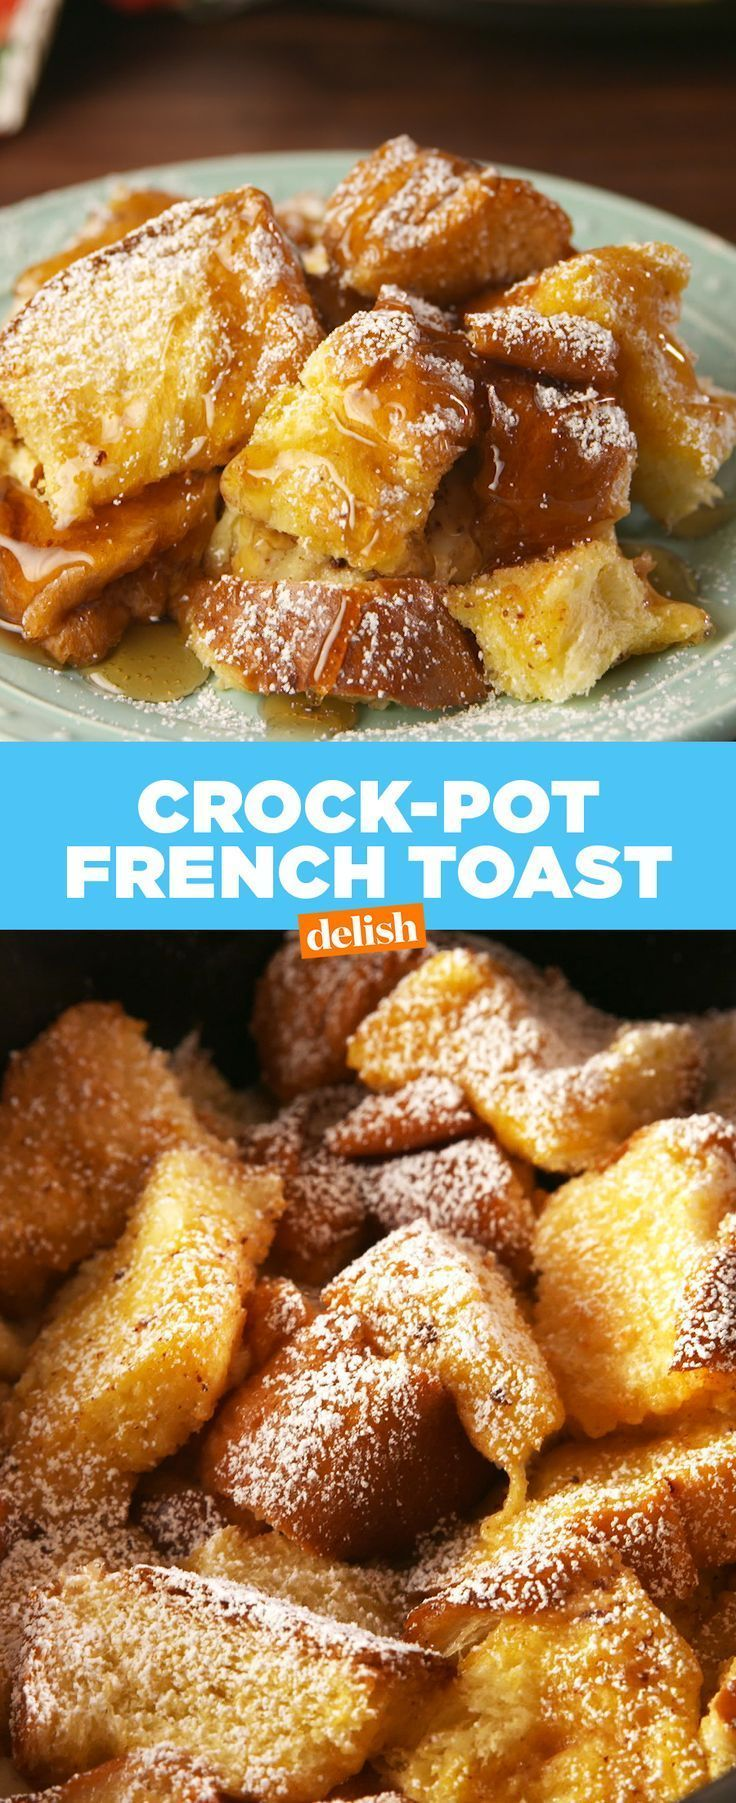 Crock-Pot français Toast